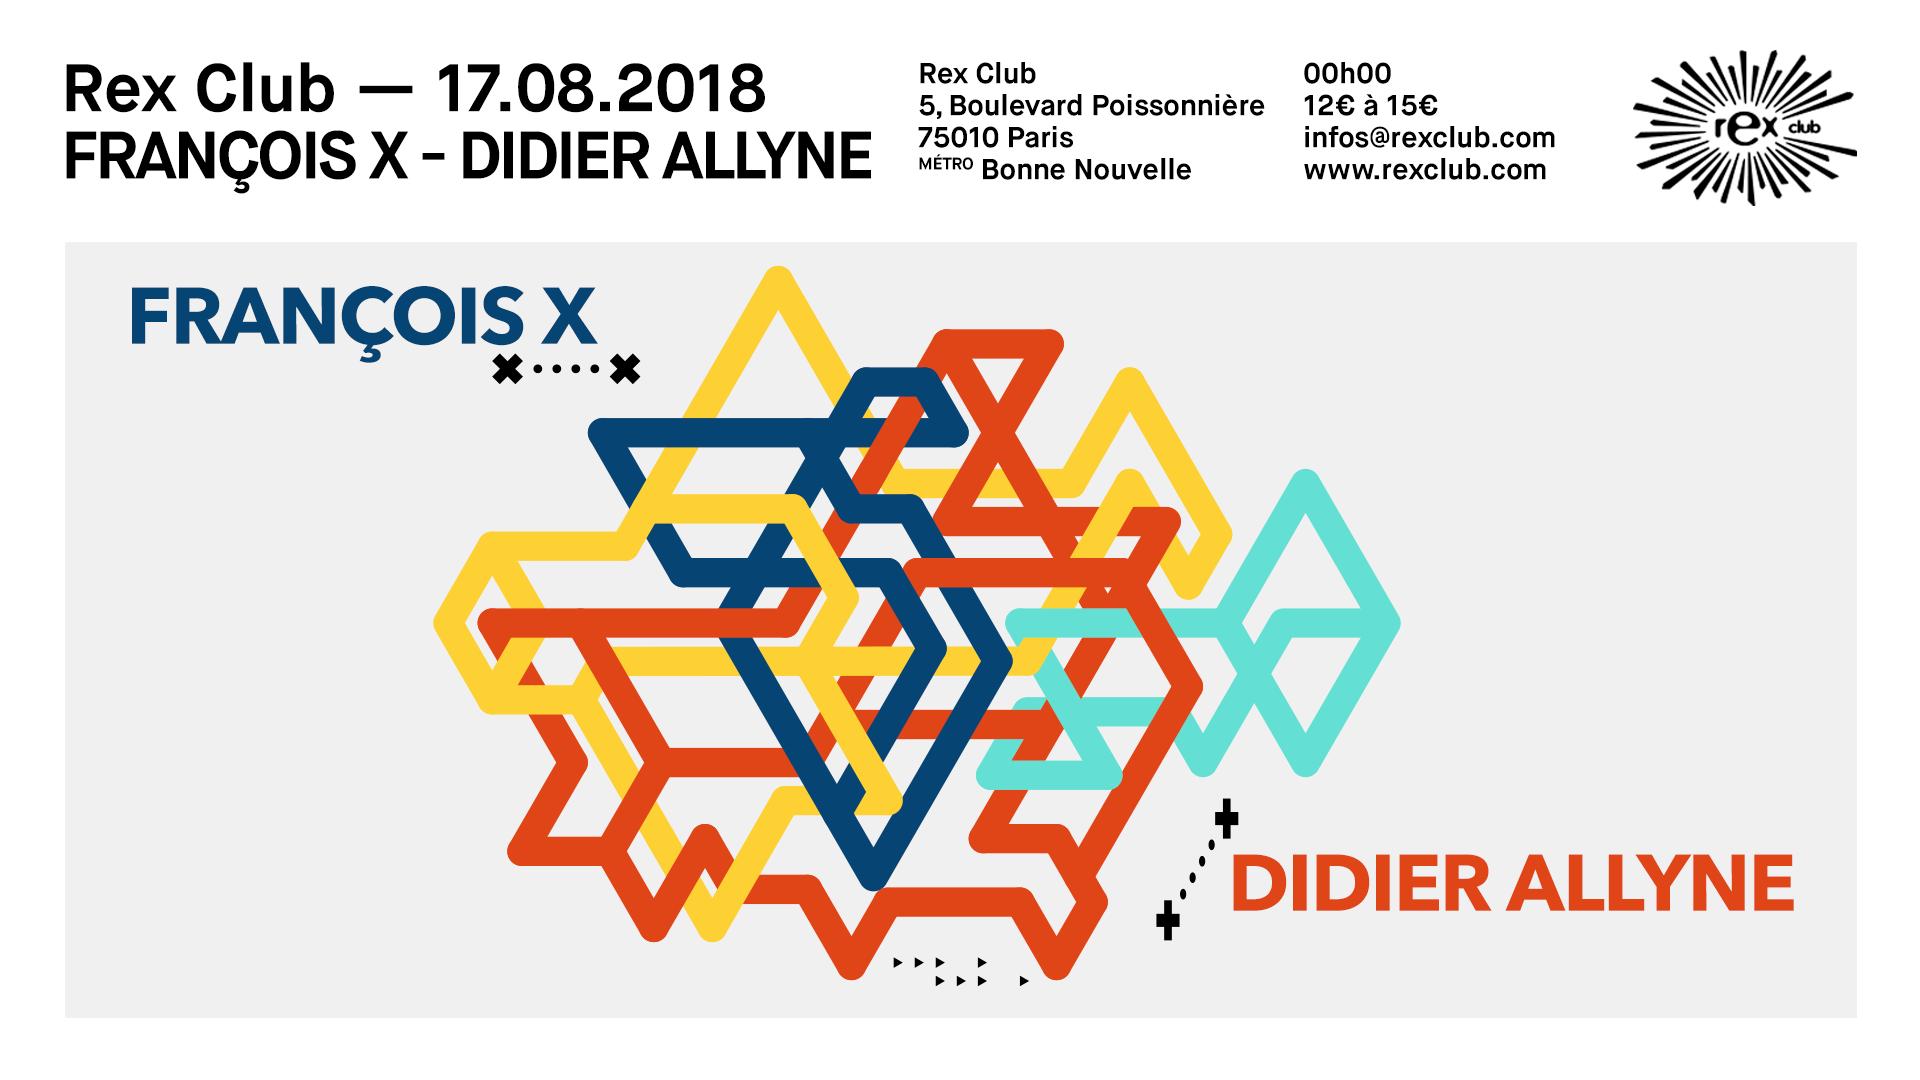 20180817_rex_club_françois_x_facebook_event_banner_1920x1080